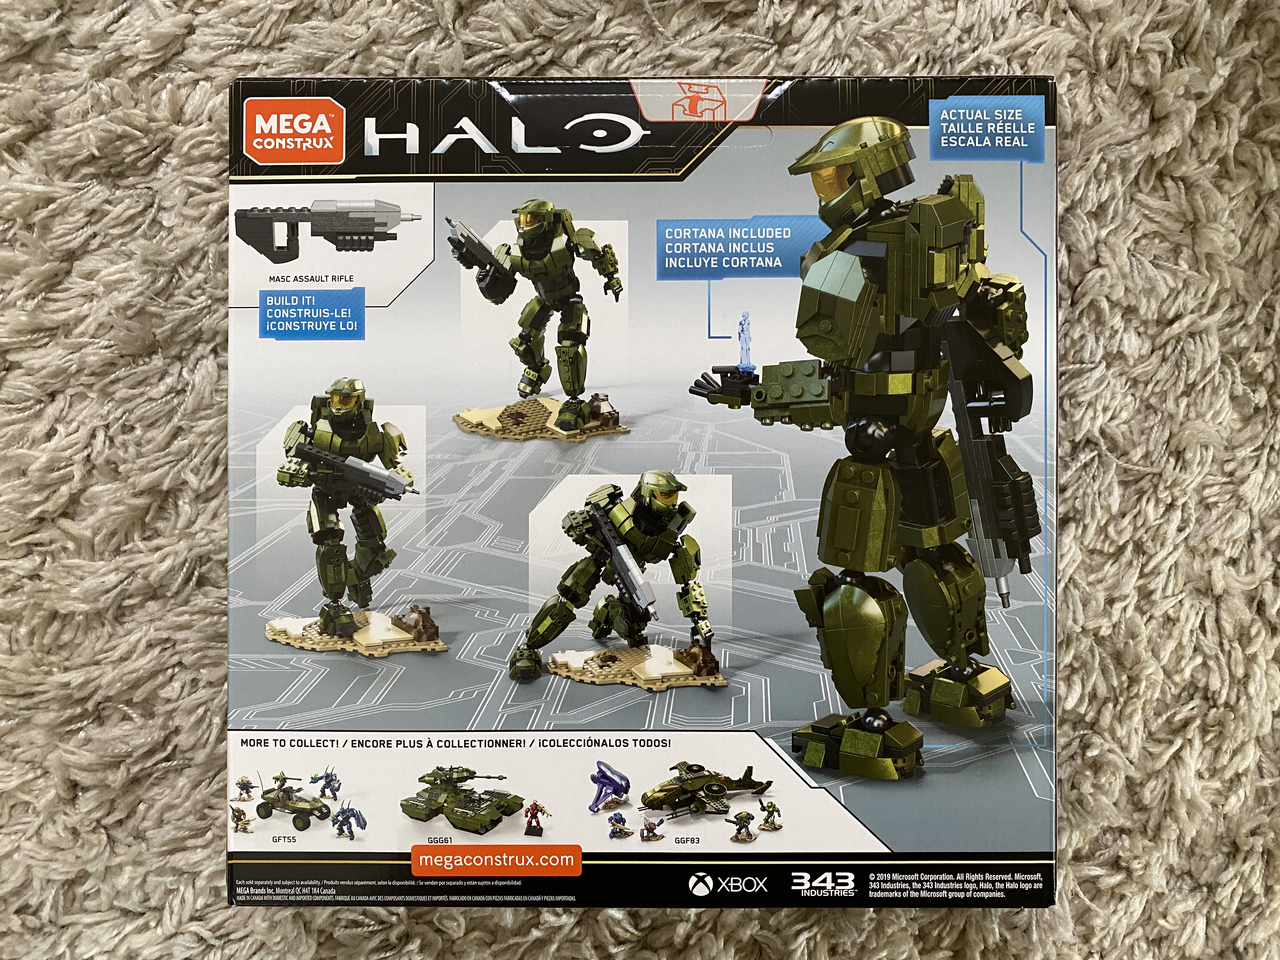 Halo: Mega Construx Back